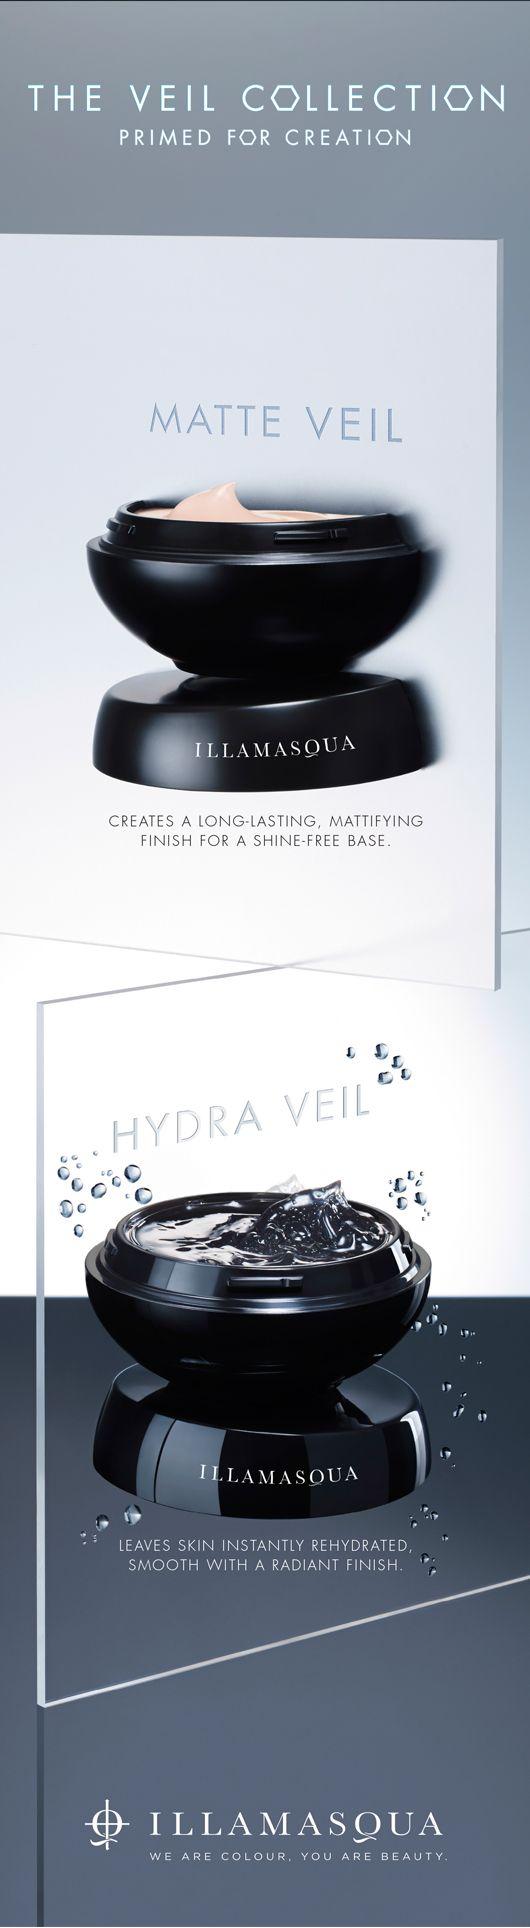 Illamasqua - The Veil Collection Launch